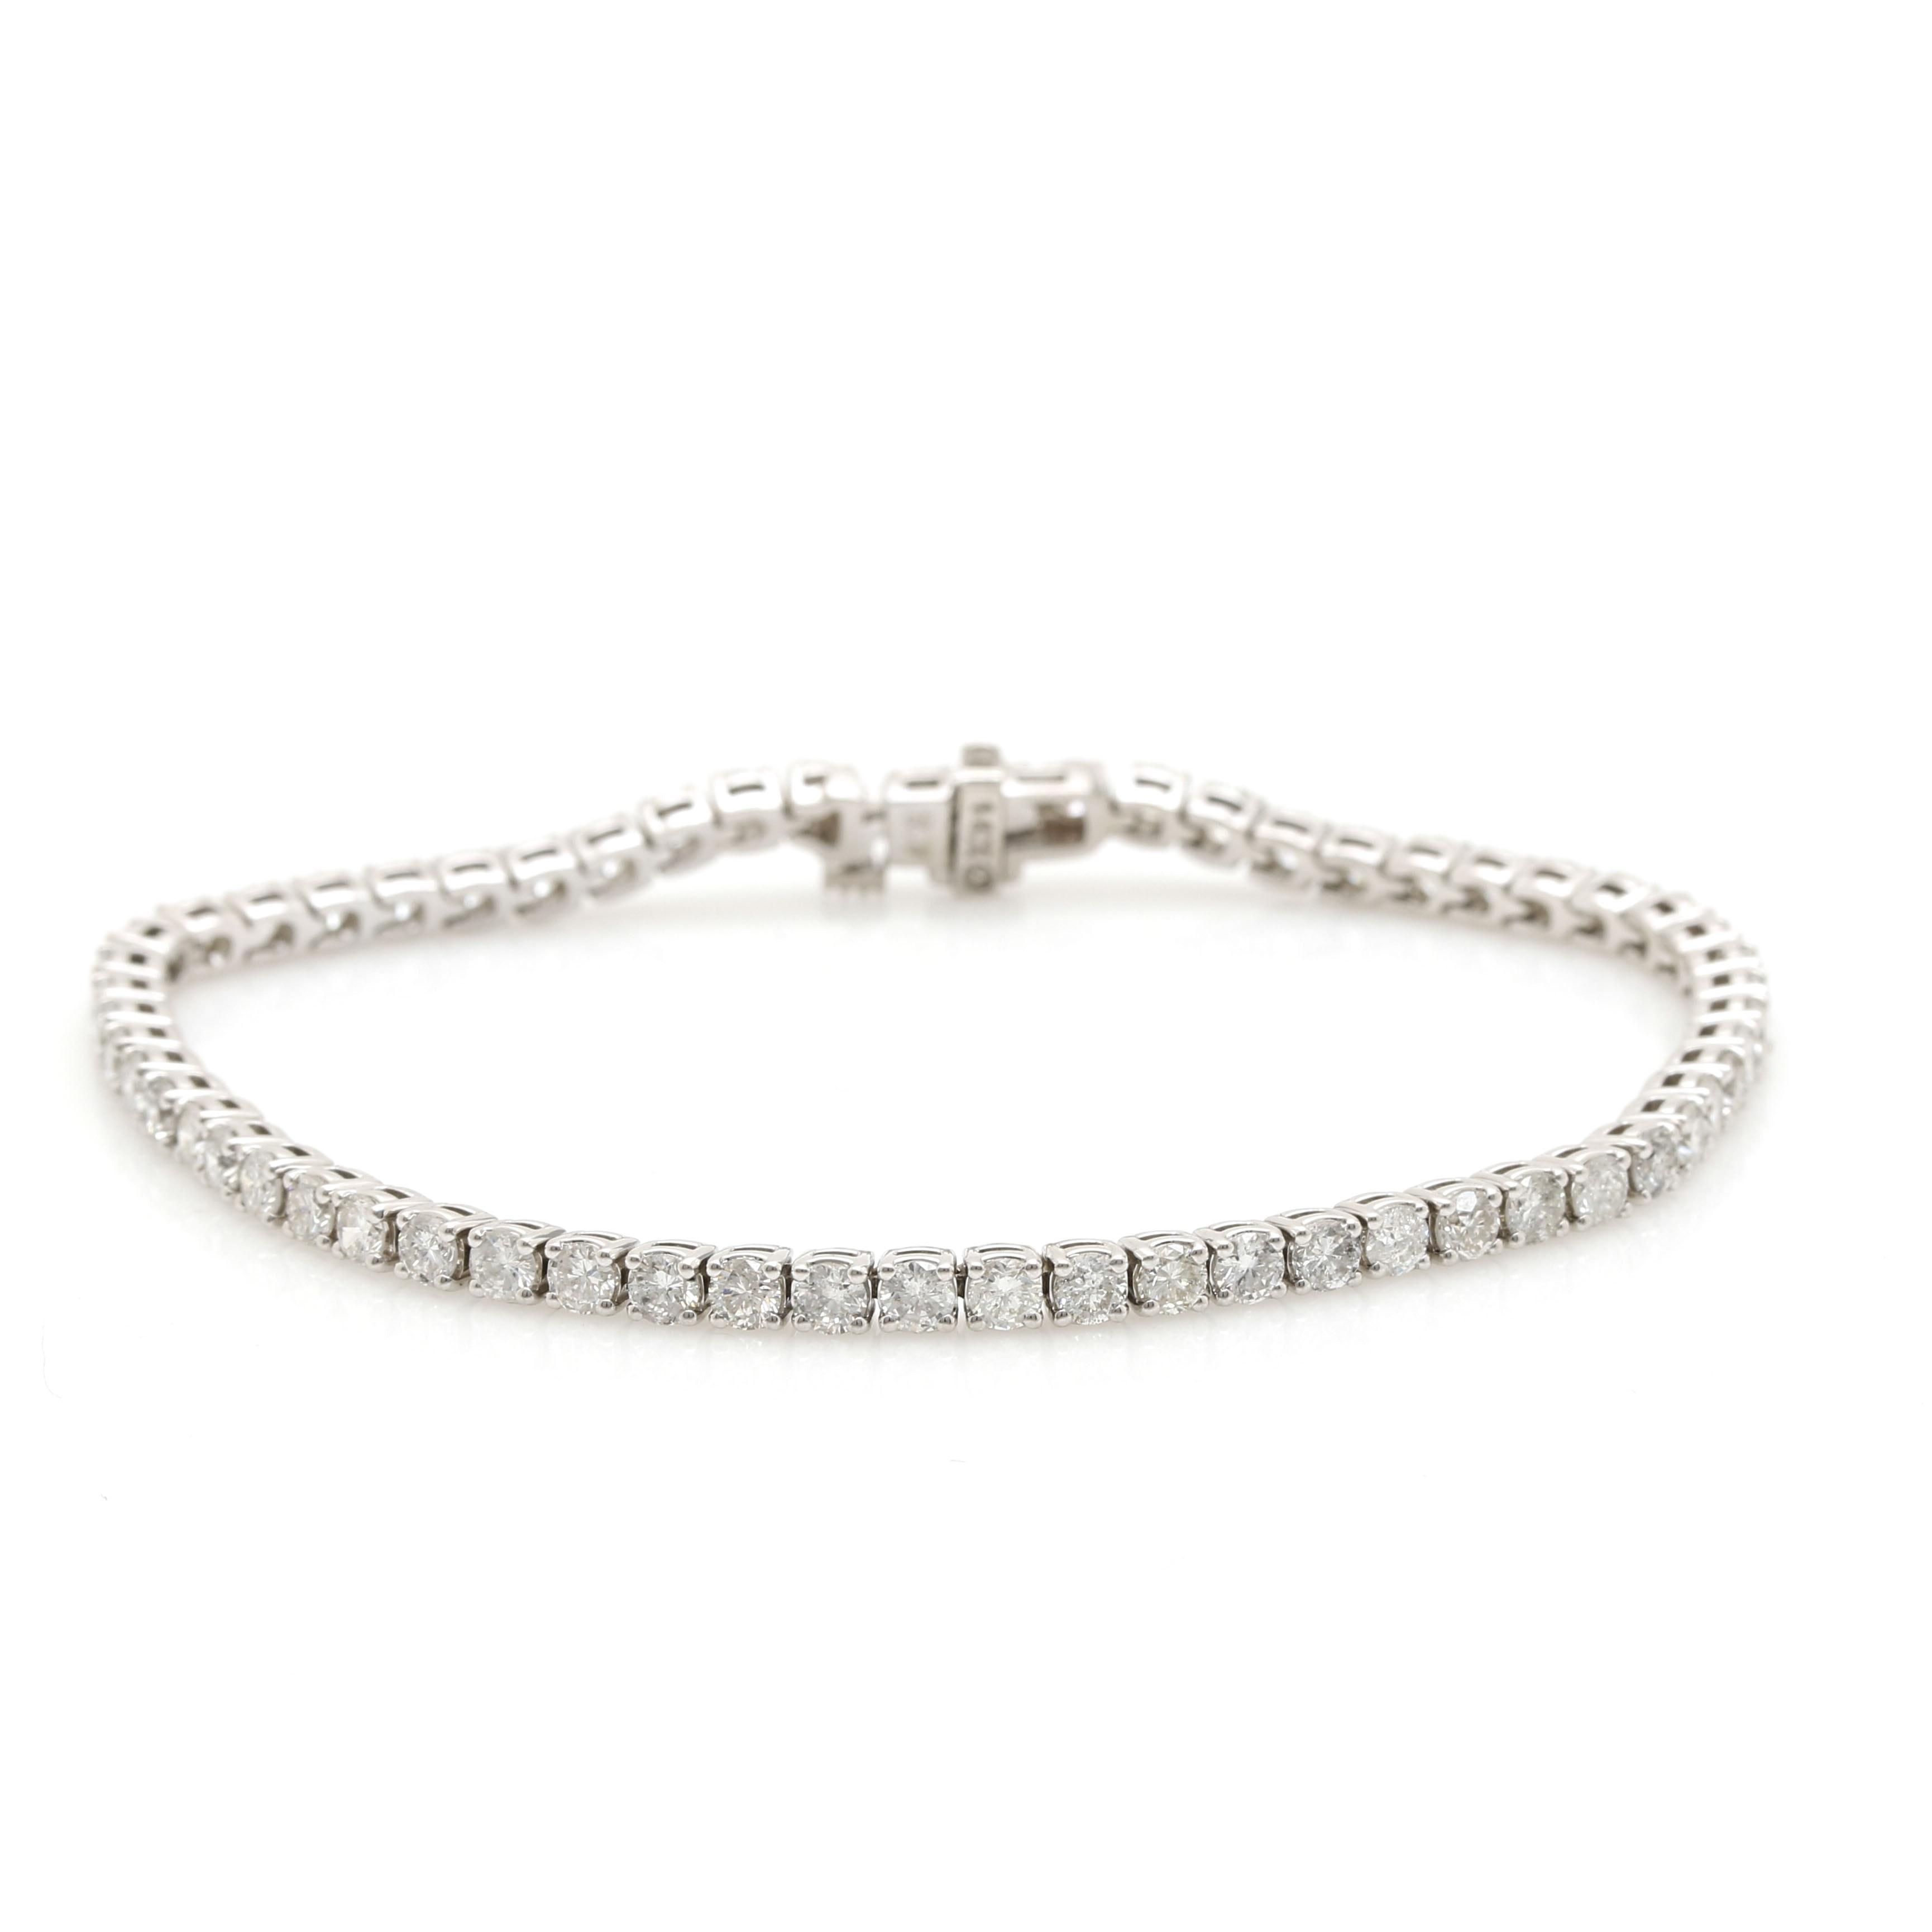 14K White Gold 4.13 CTW Diamond Tennis Bracelet